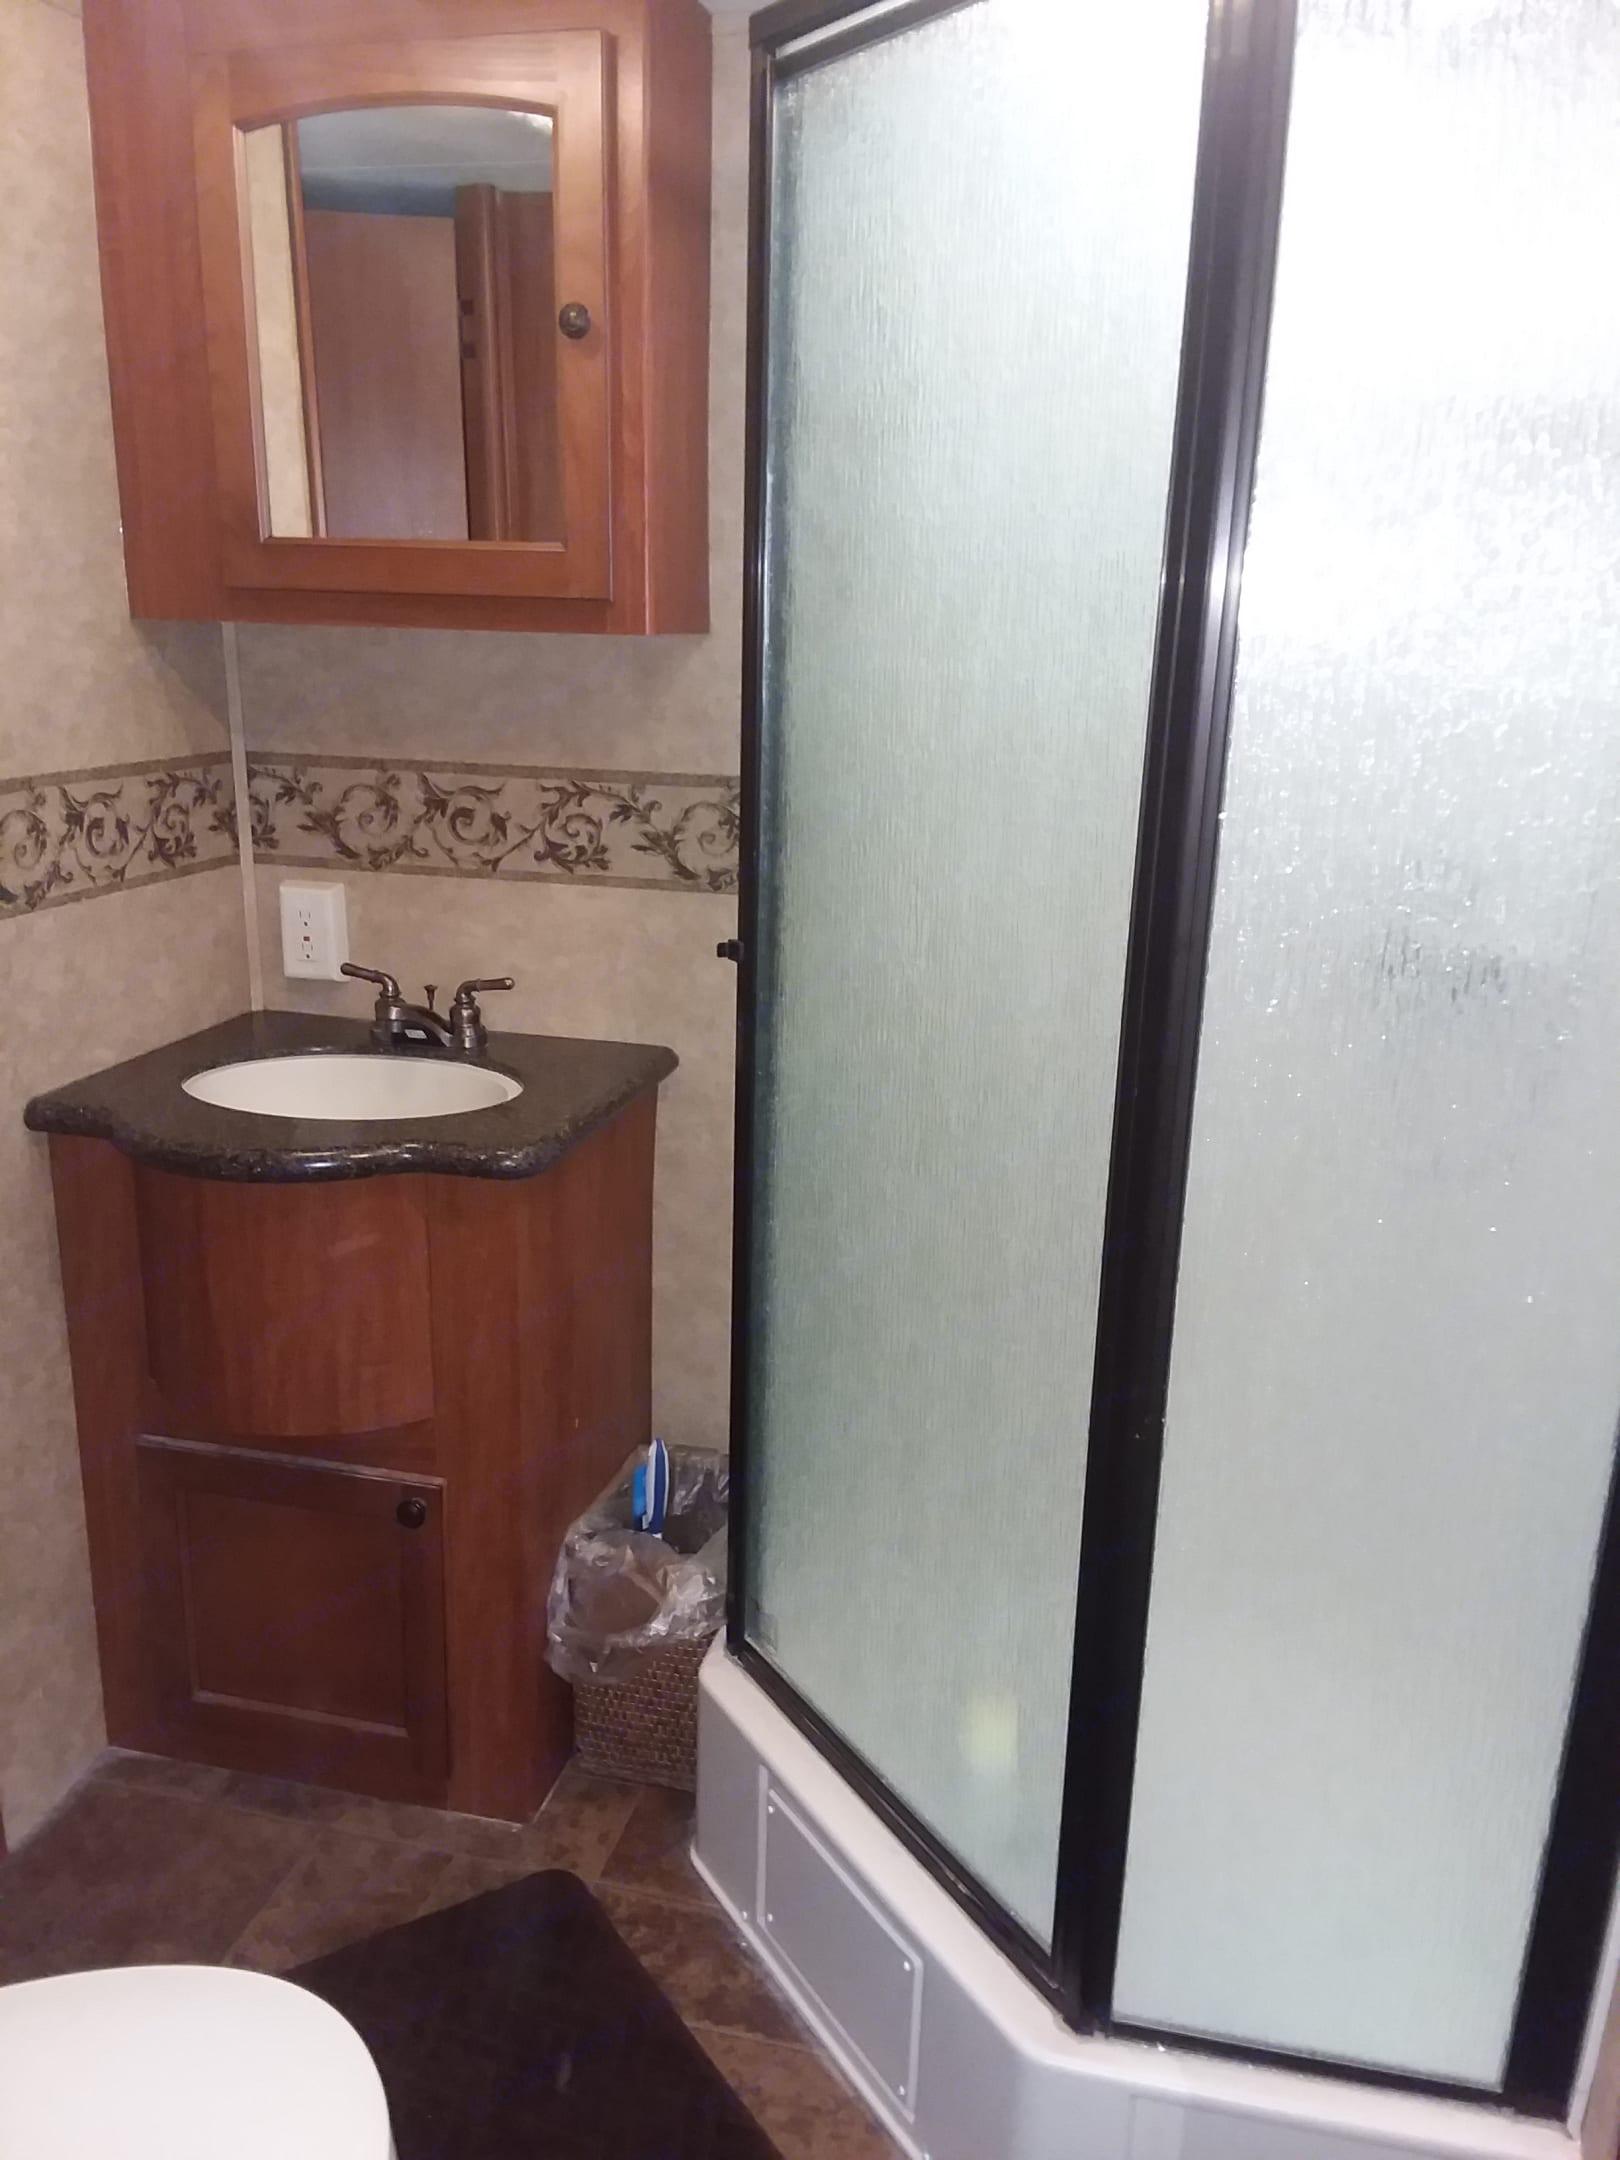 Bathroom sink and walk-in shower.. Heartland Caliber 2012